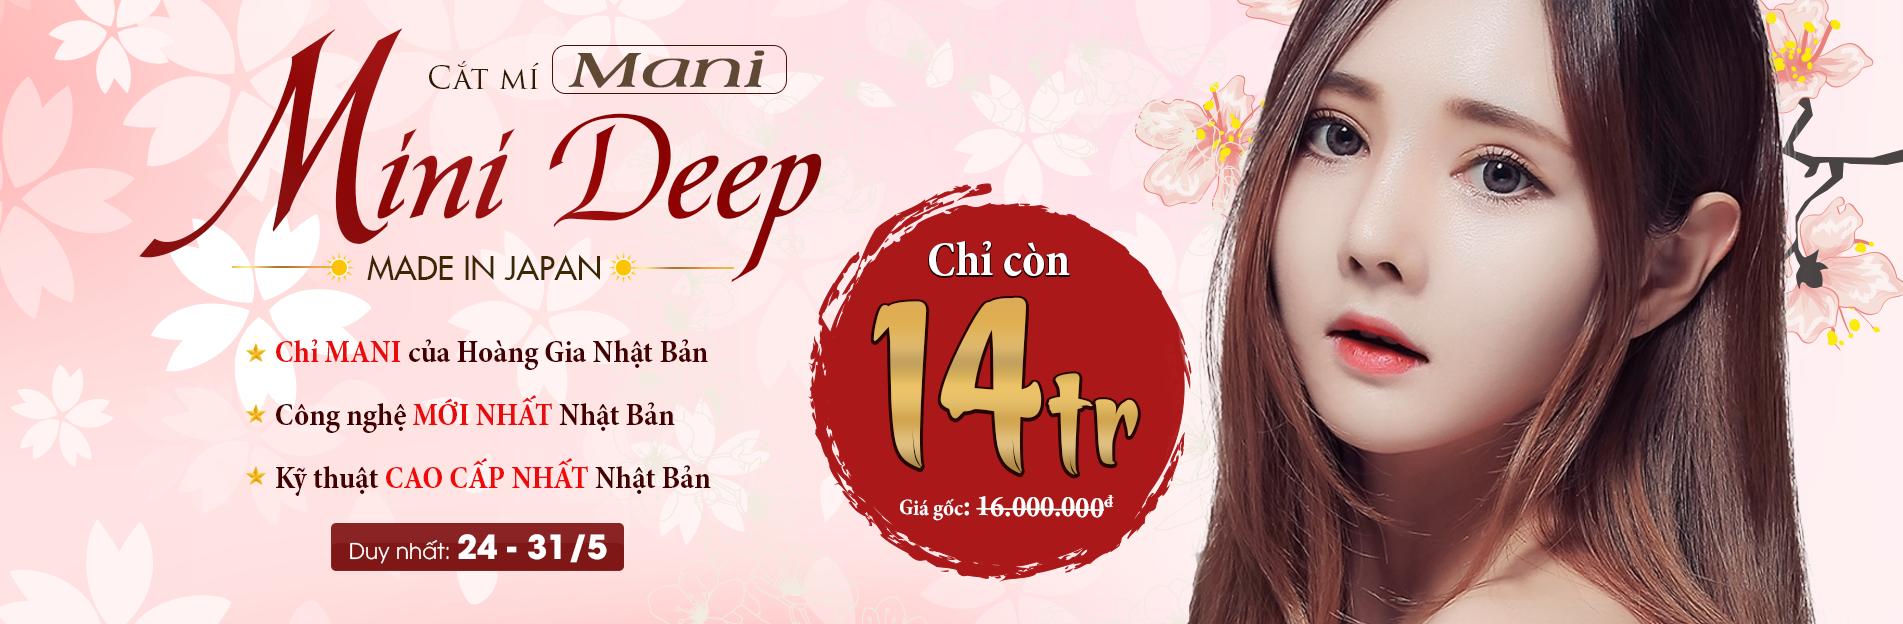 Banner Mani Mini Deep